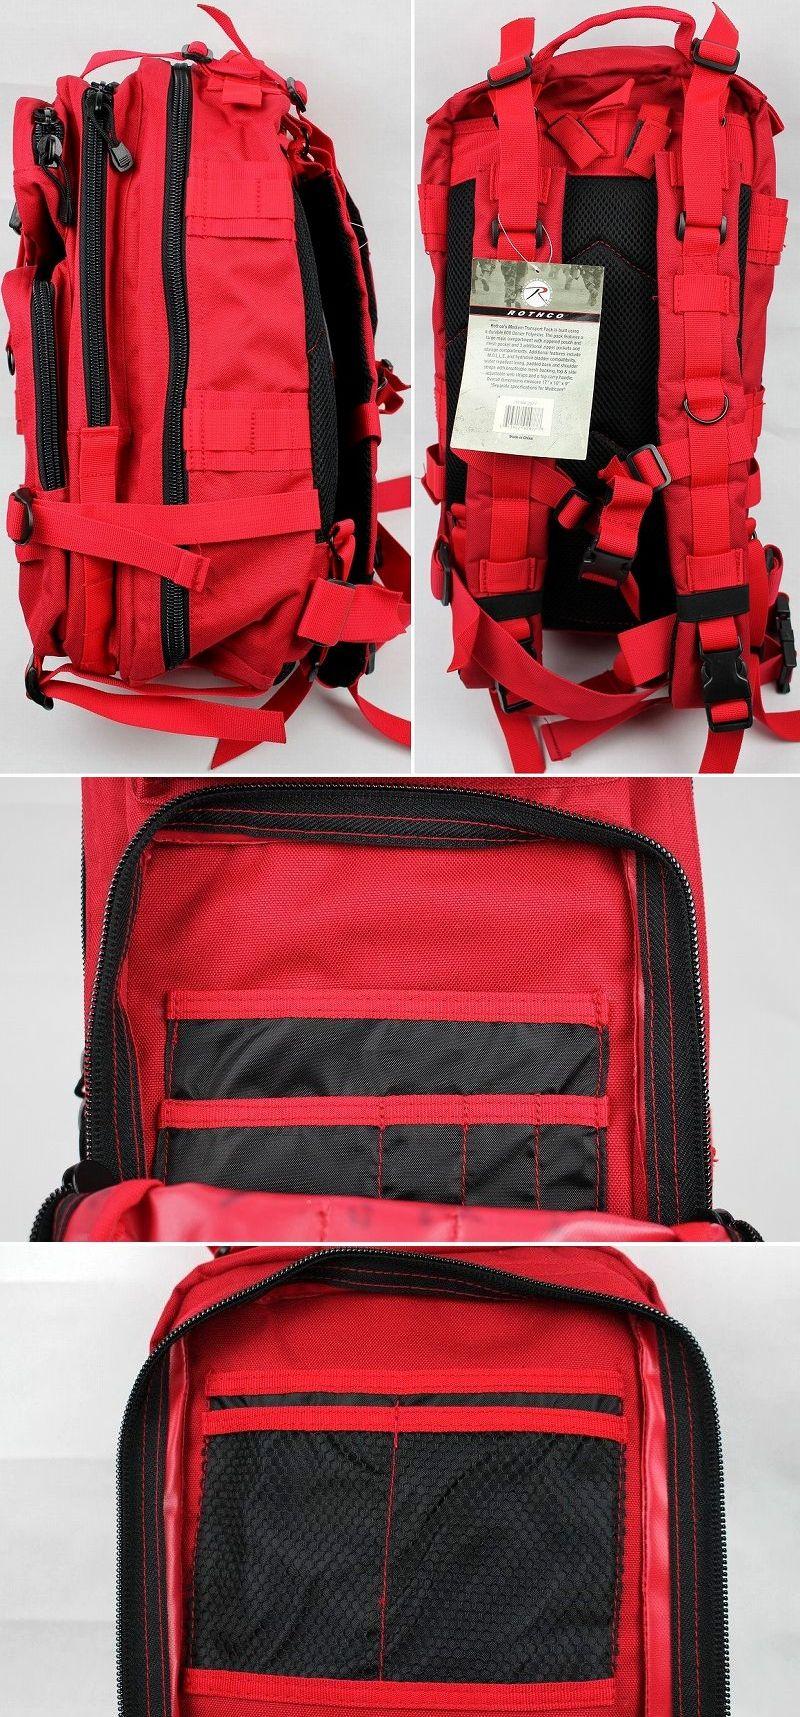 ROTHCO / MEDIUM TRANSPORT PACK / red